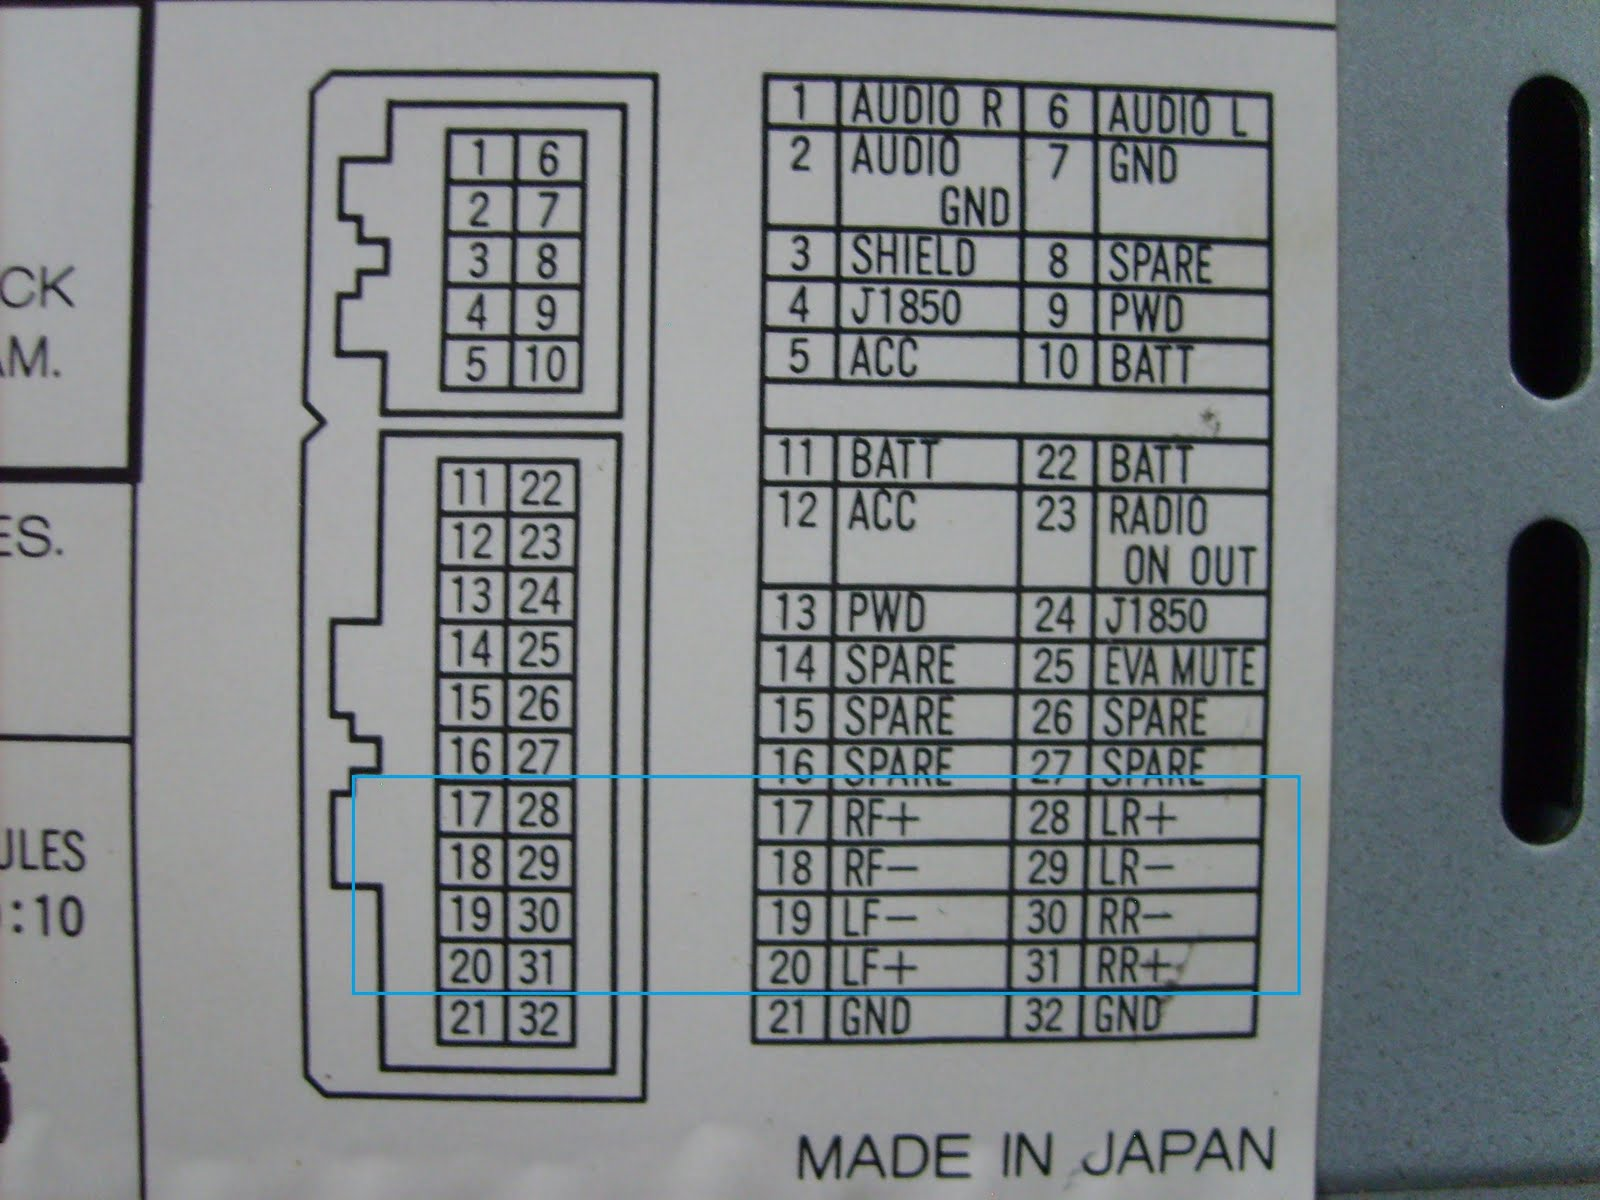 2008 Dodge Ram 2500 Infinity Stereo Wiring Diagram List Of 1988 Pontiac Delco Radio 2006 Nemetas Aufgegabelt Rh Info